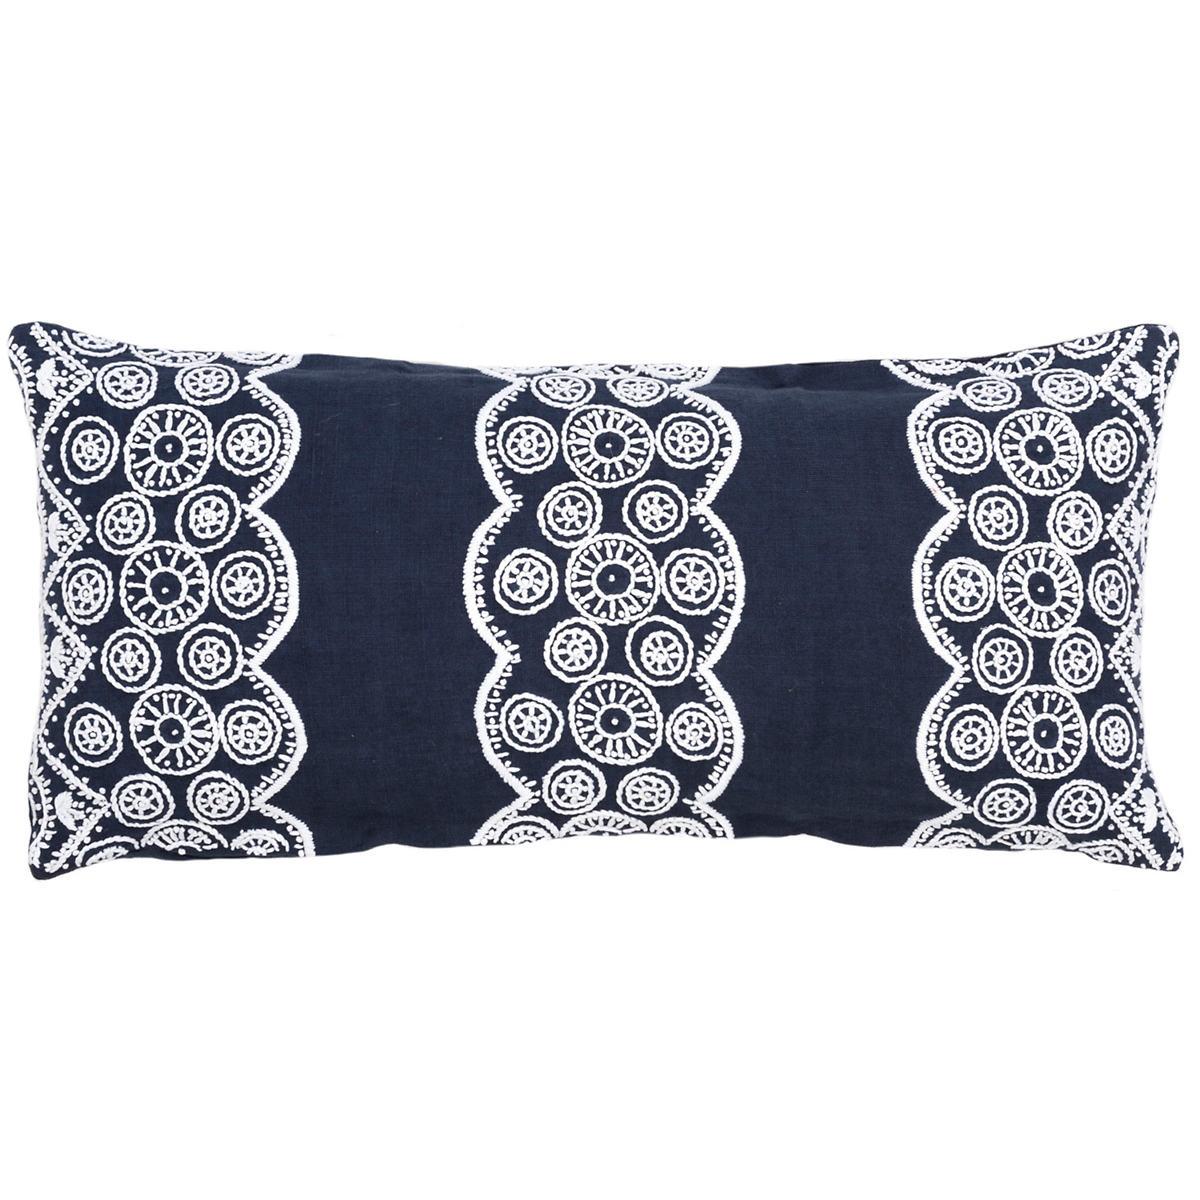 French Knot Indigo Decorative Pillow Double Boudoir